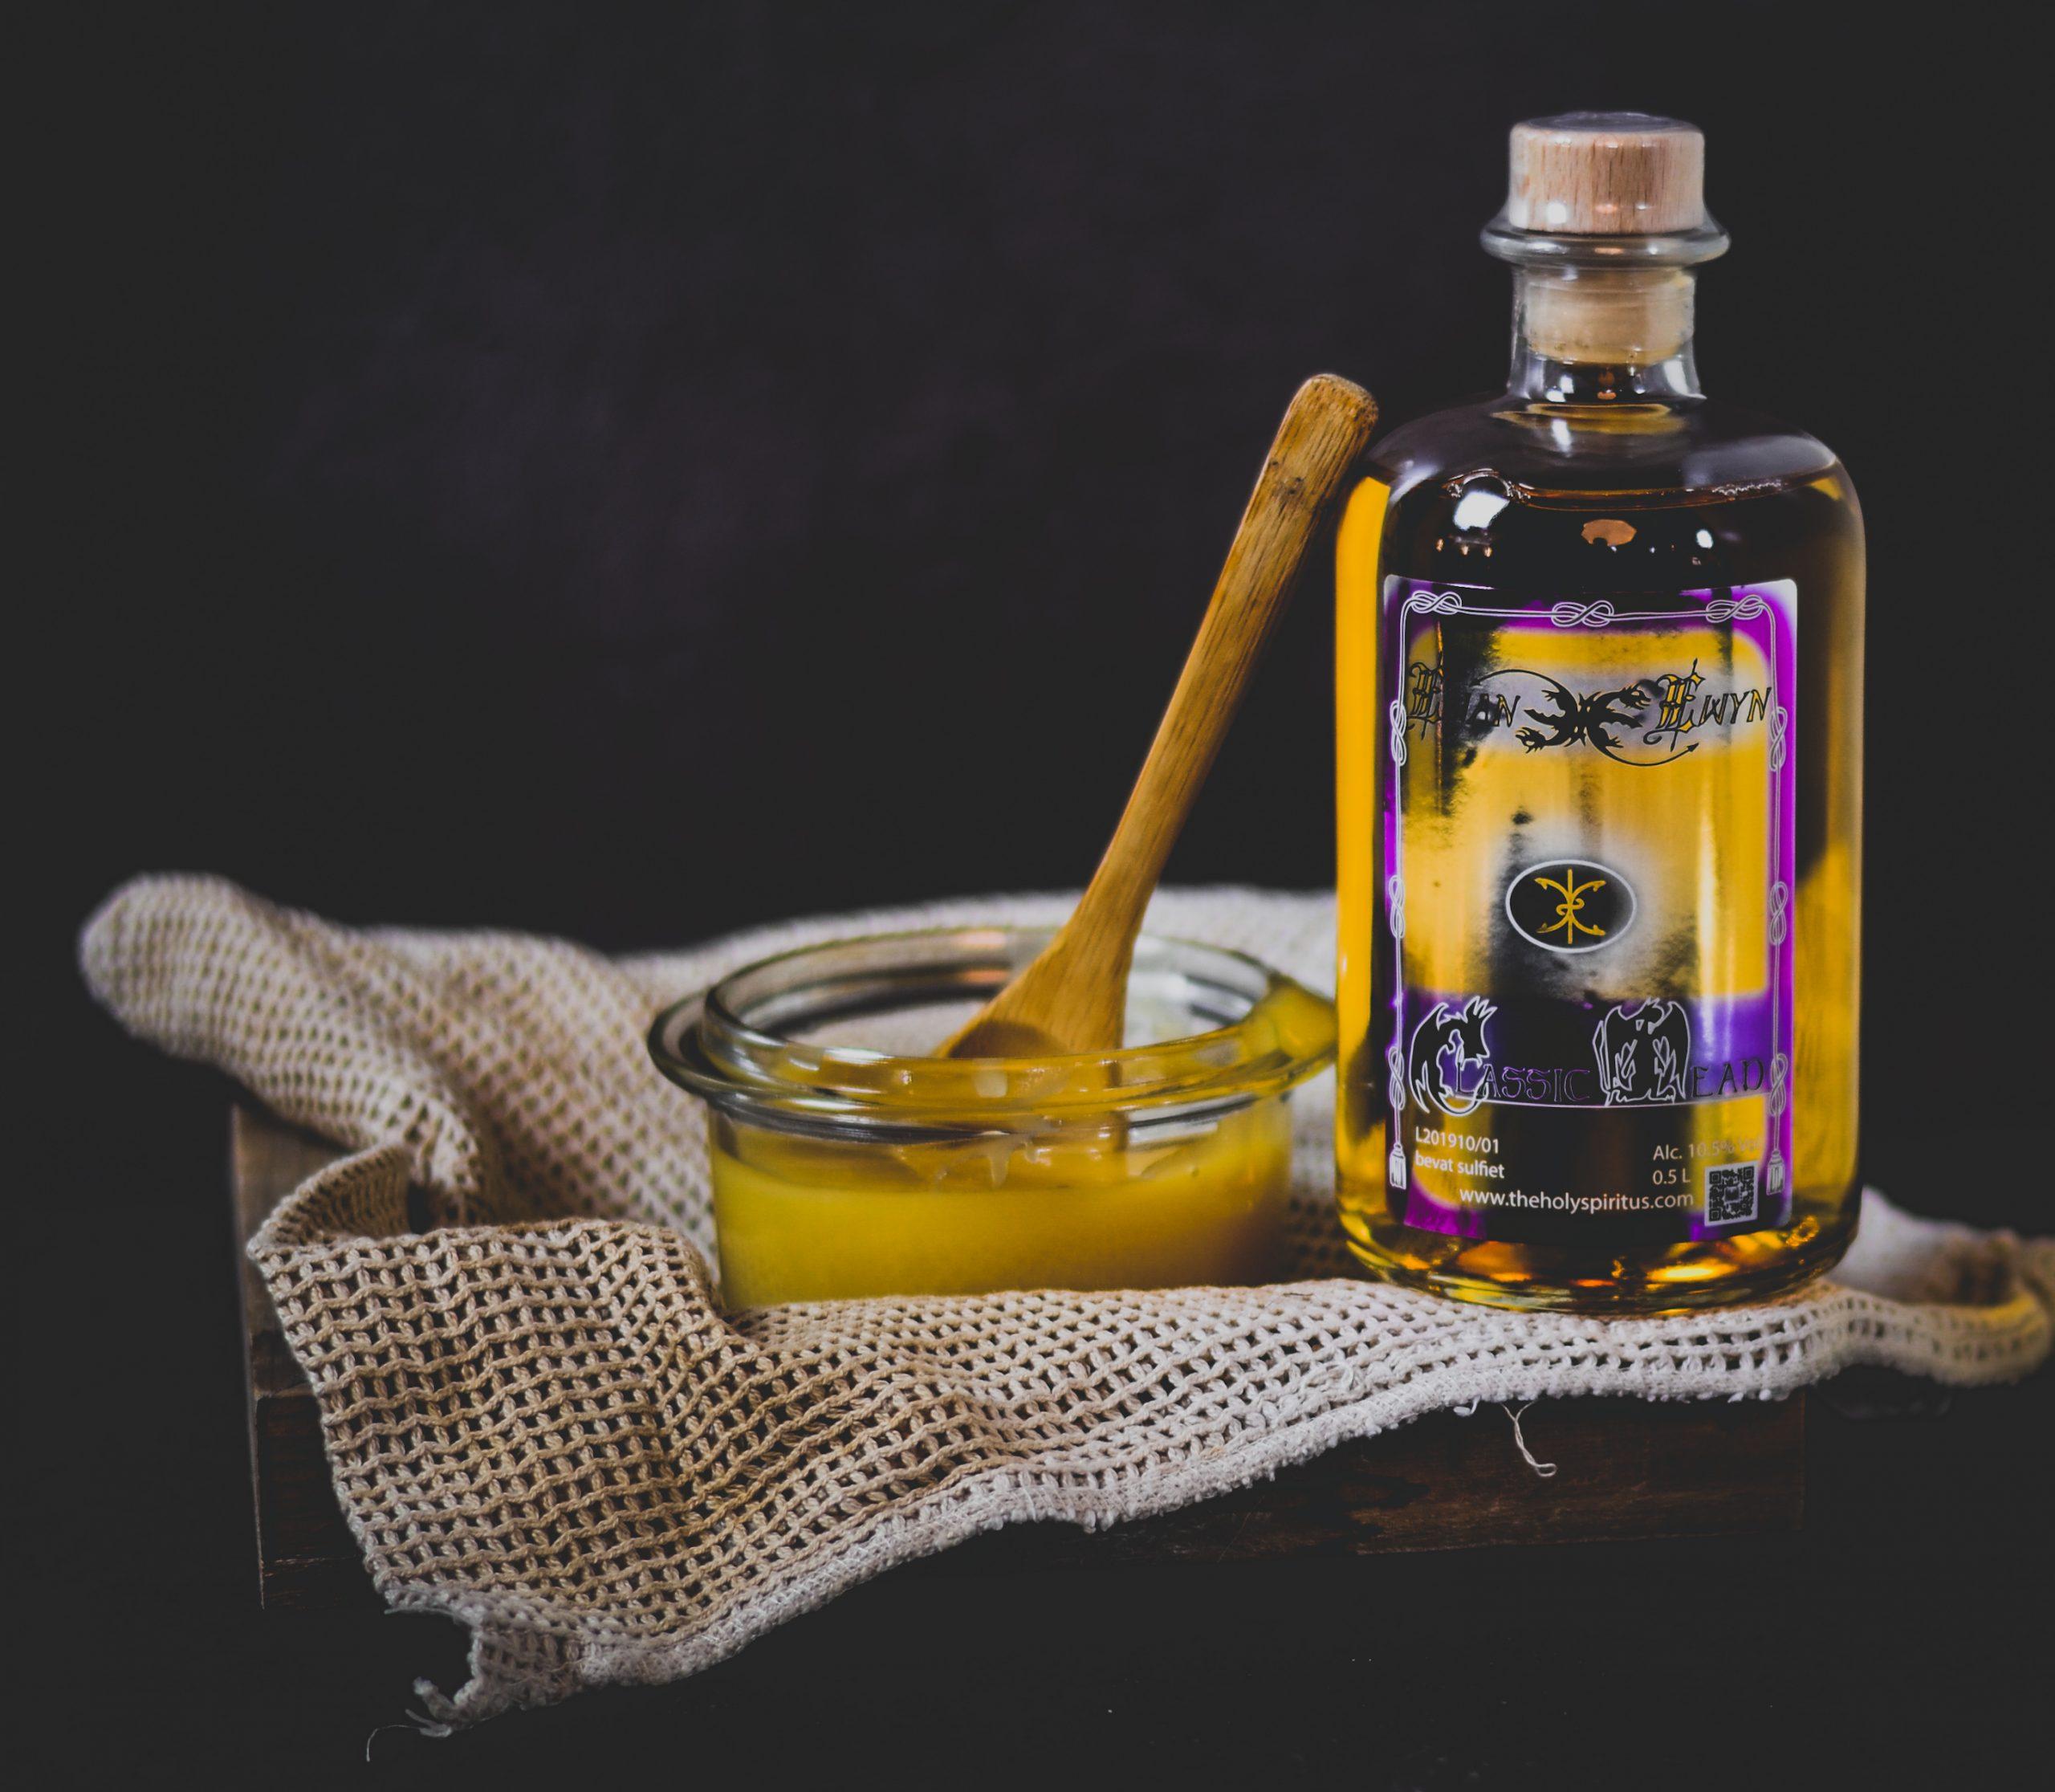 honingwijn-sint-jansteen-the-holy-spiritus